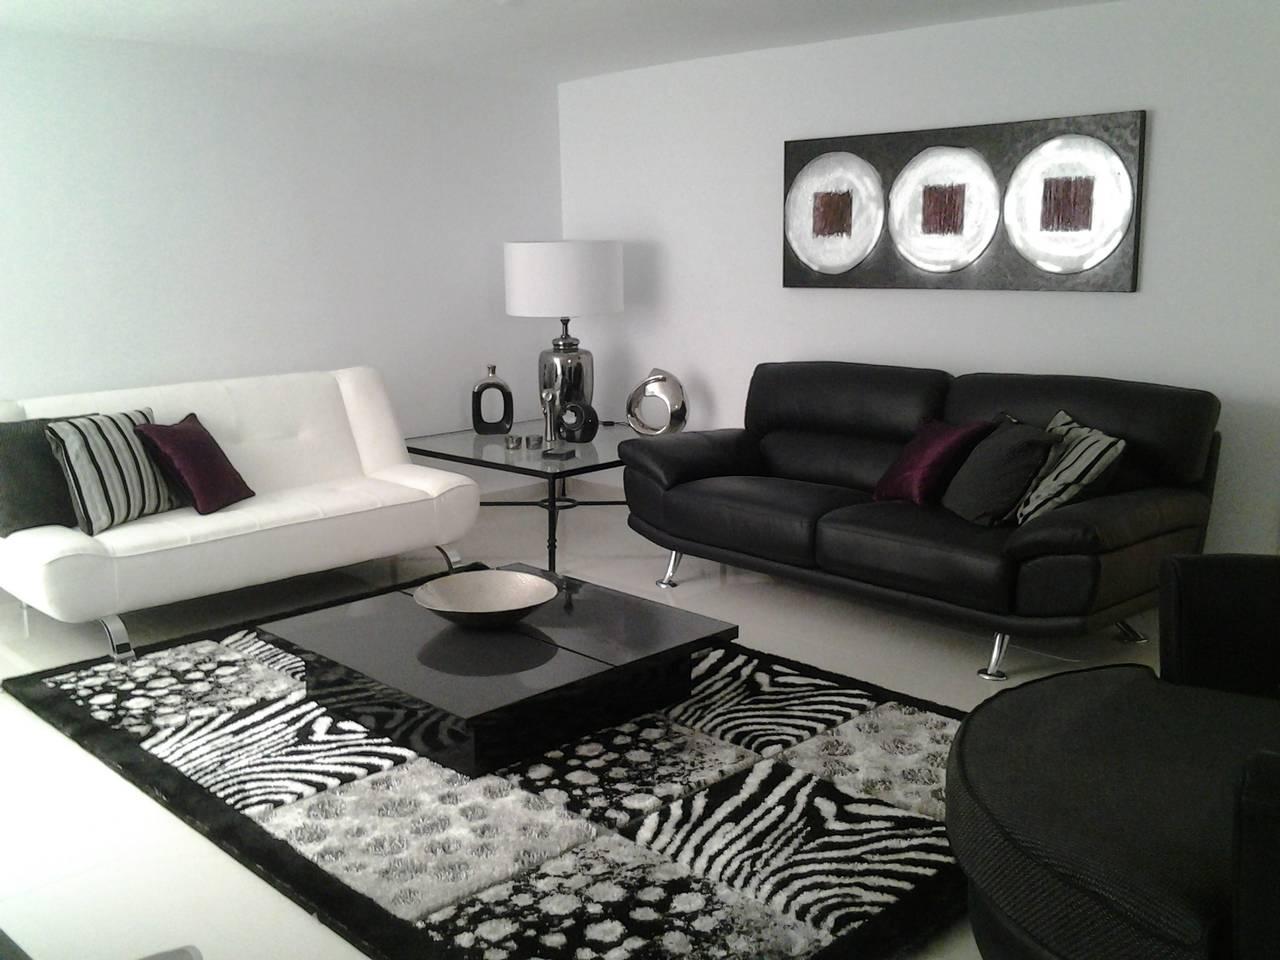 luxury 6 rooms villa with pool & jacuzzi - P.banus photo 25855546